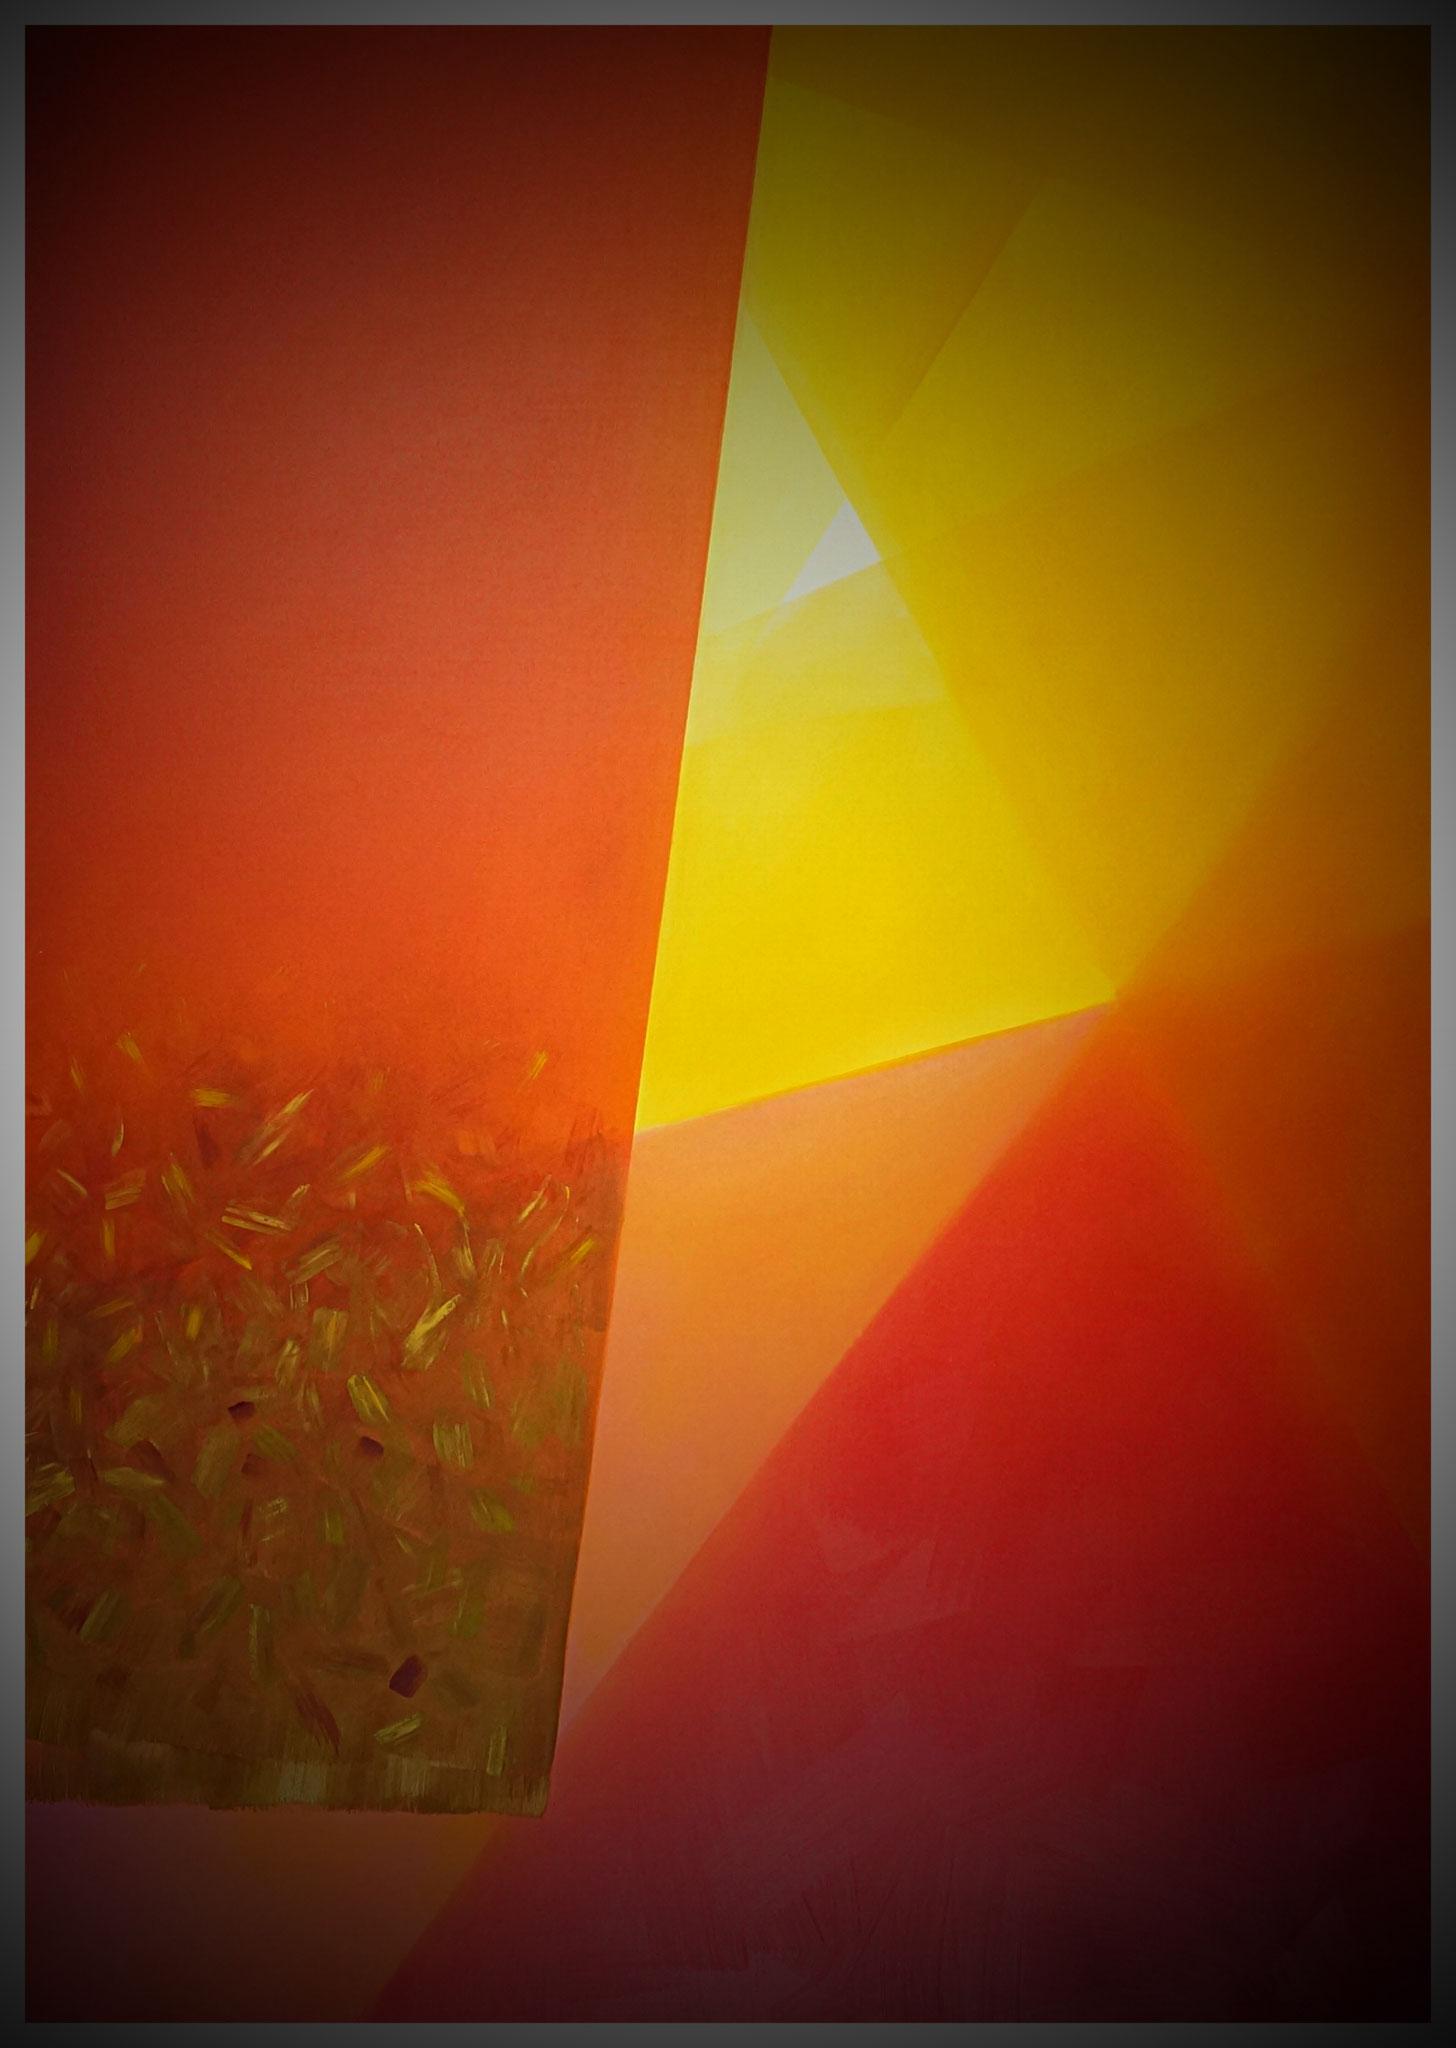 Rouge Royal - Ölfarbe auf Leinwand - 120x90